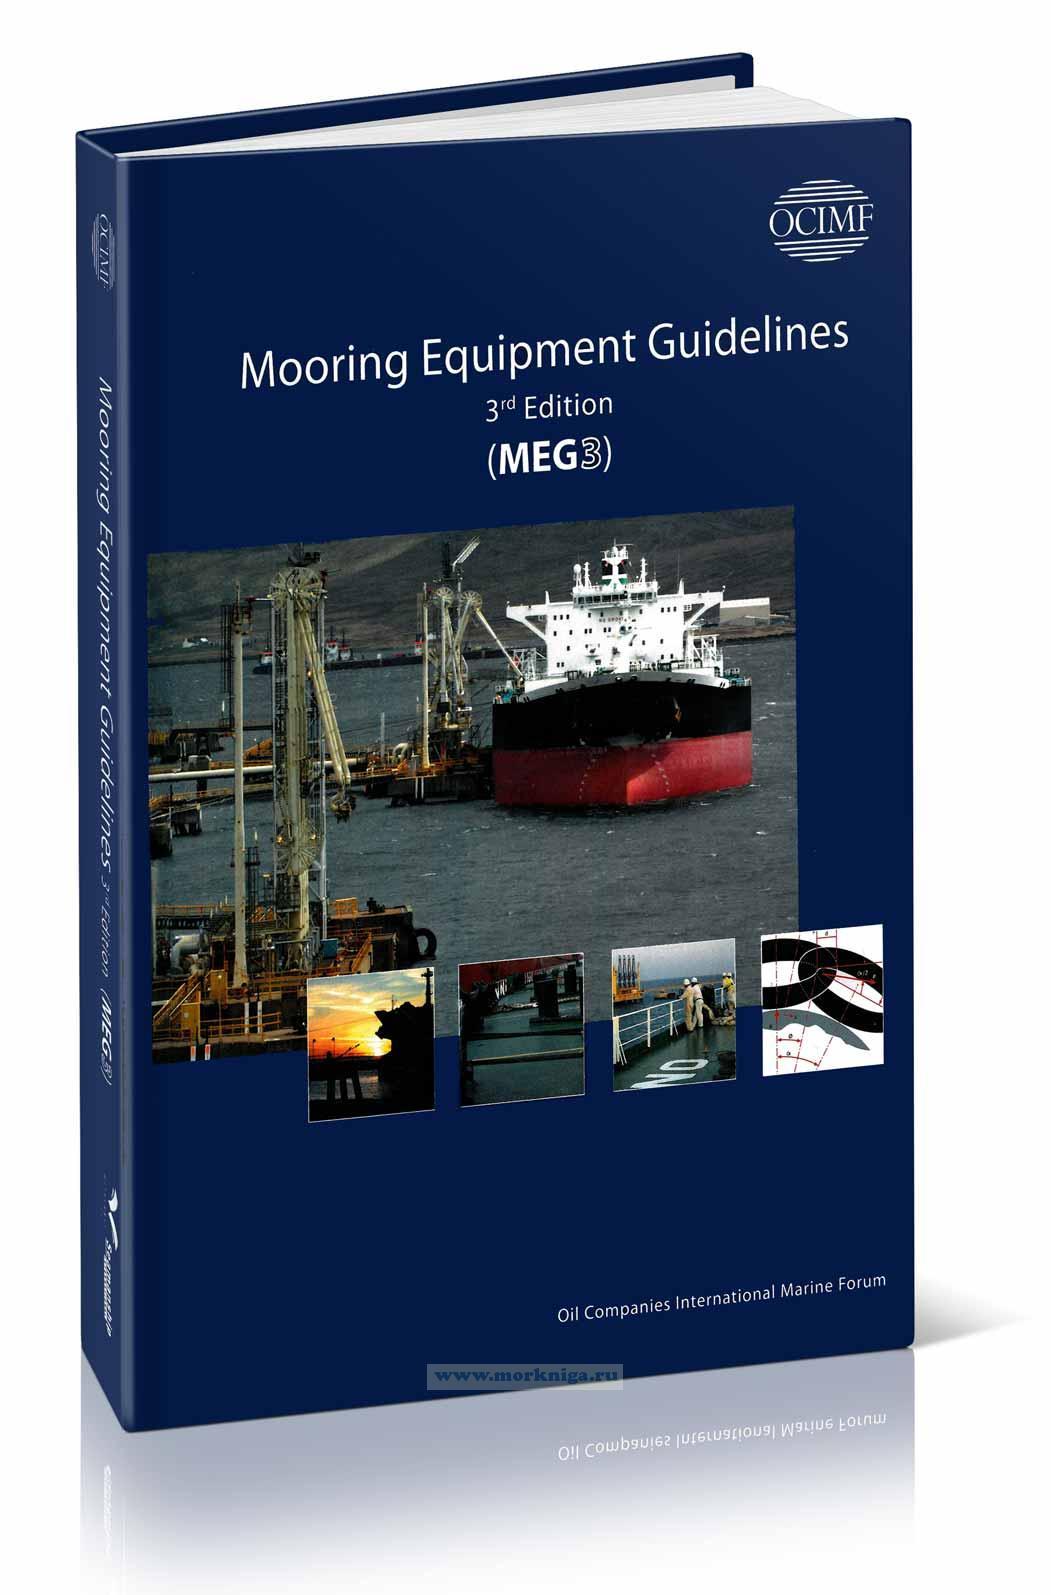 mooring equipment guidelines rh morkniga ru mooring equipment guidelines 3rd edition mooring equipment guidelines (meg4) draft